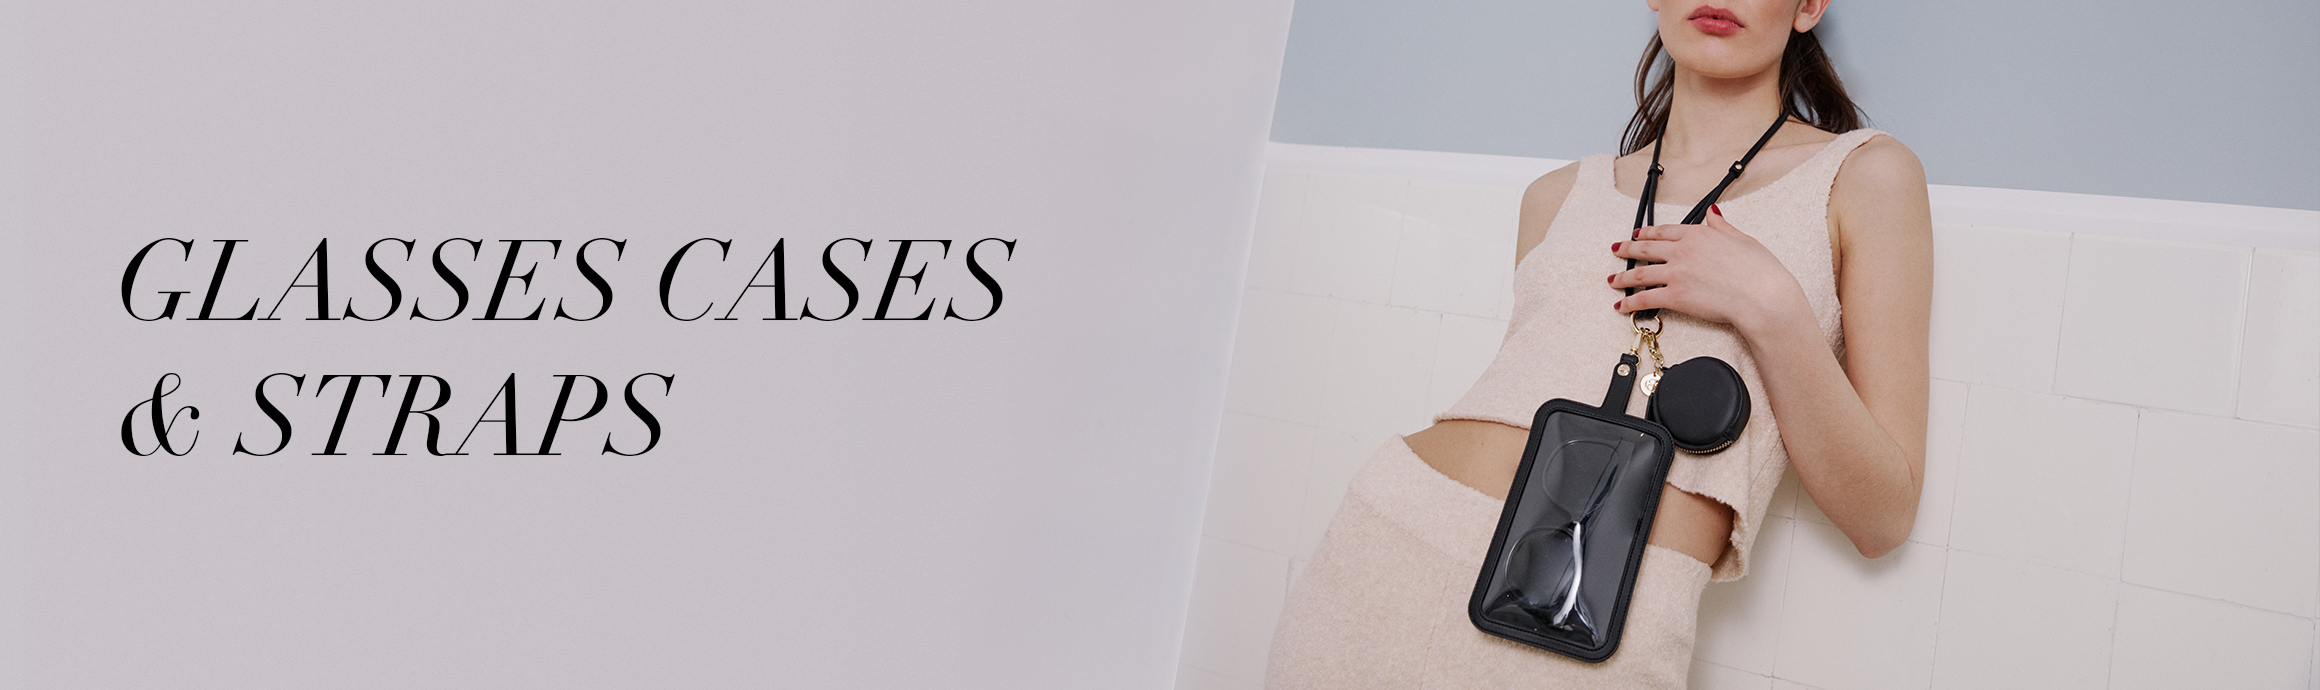 glasses cases & straps